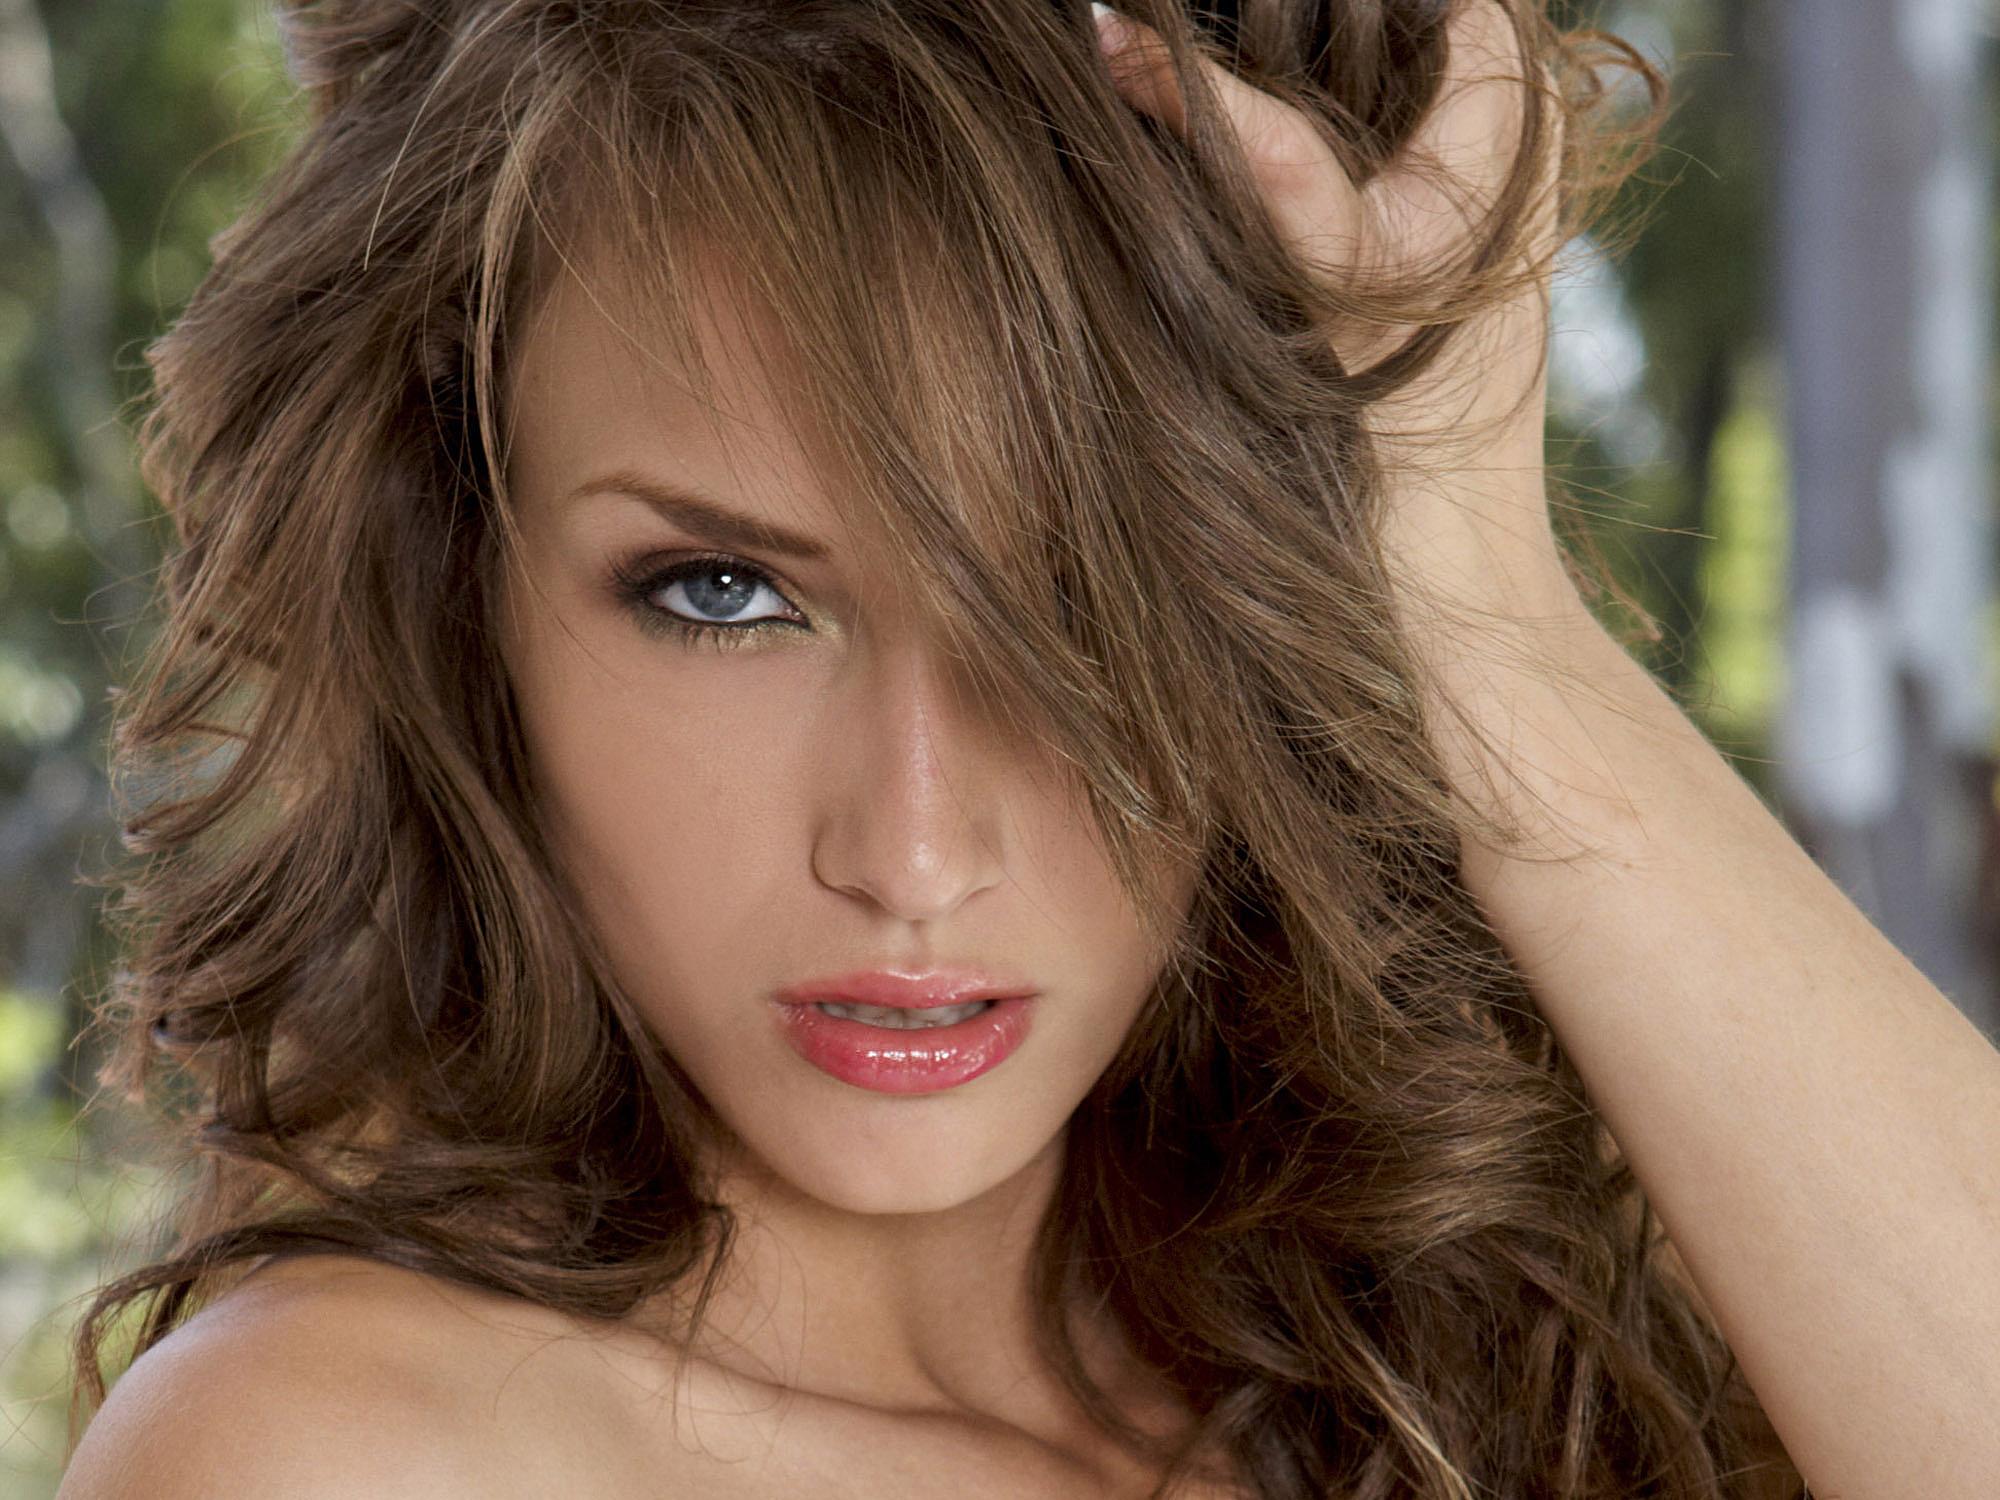 онлайн видео с красивыми девушк